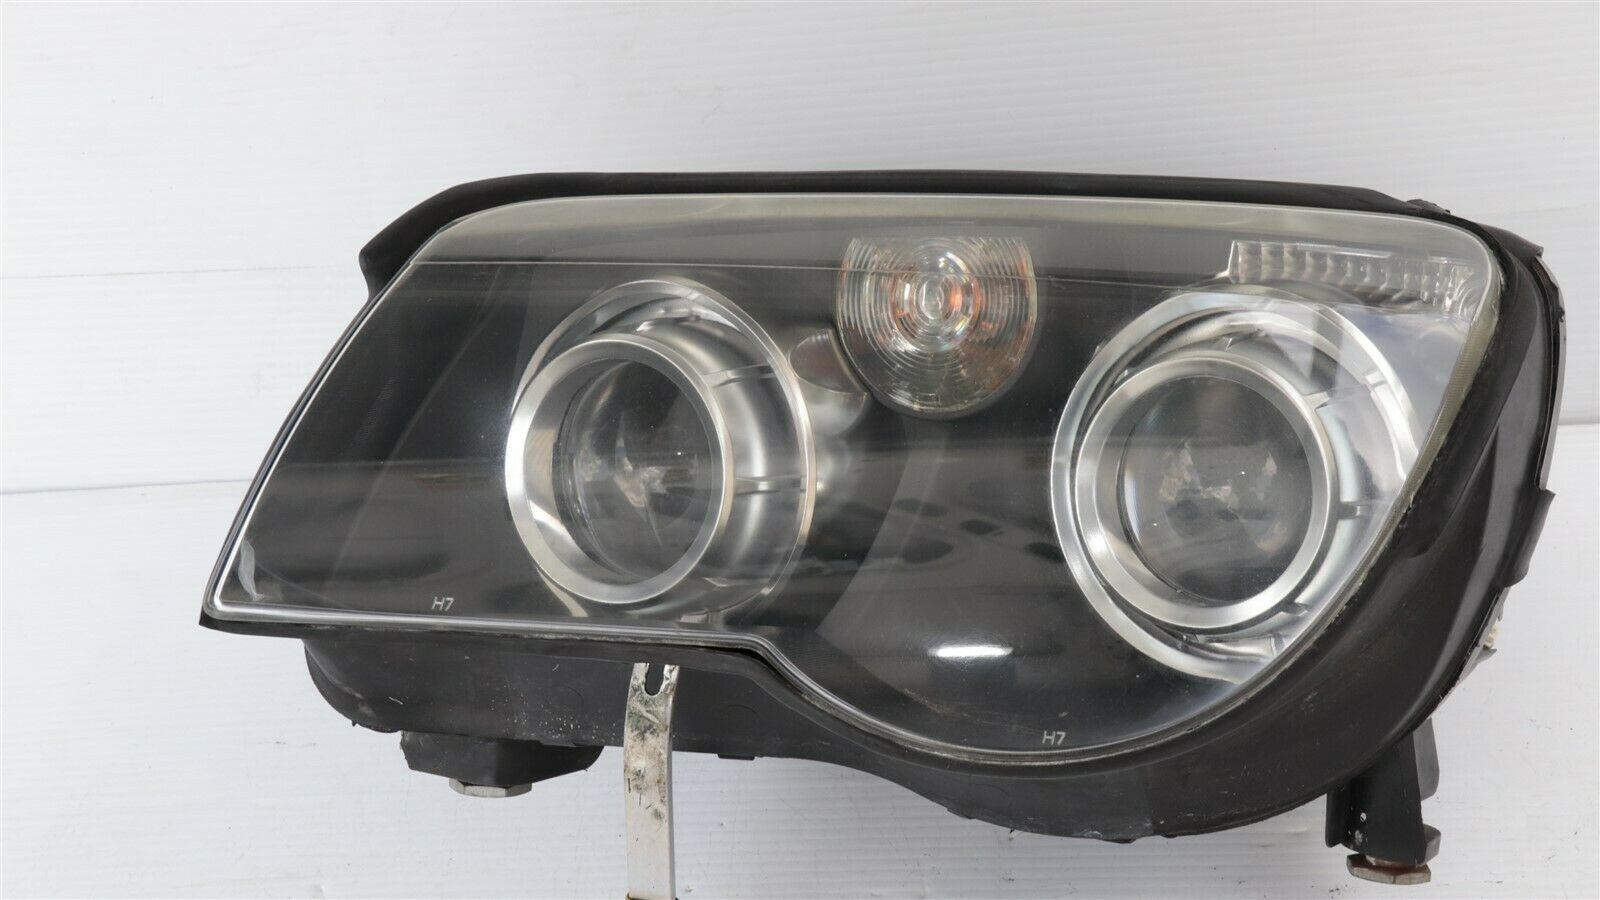 CrossFire Cross Fire Headlight Head Light Lamp Driver Left LH - POLISHED